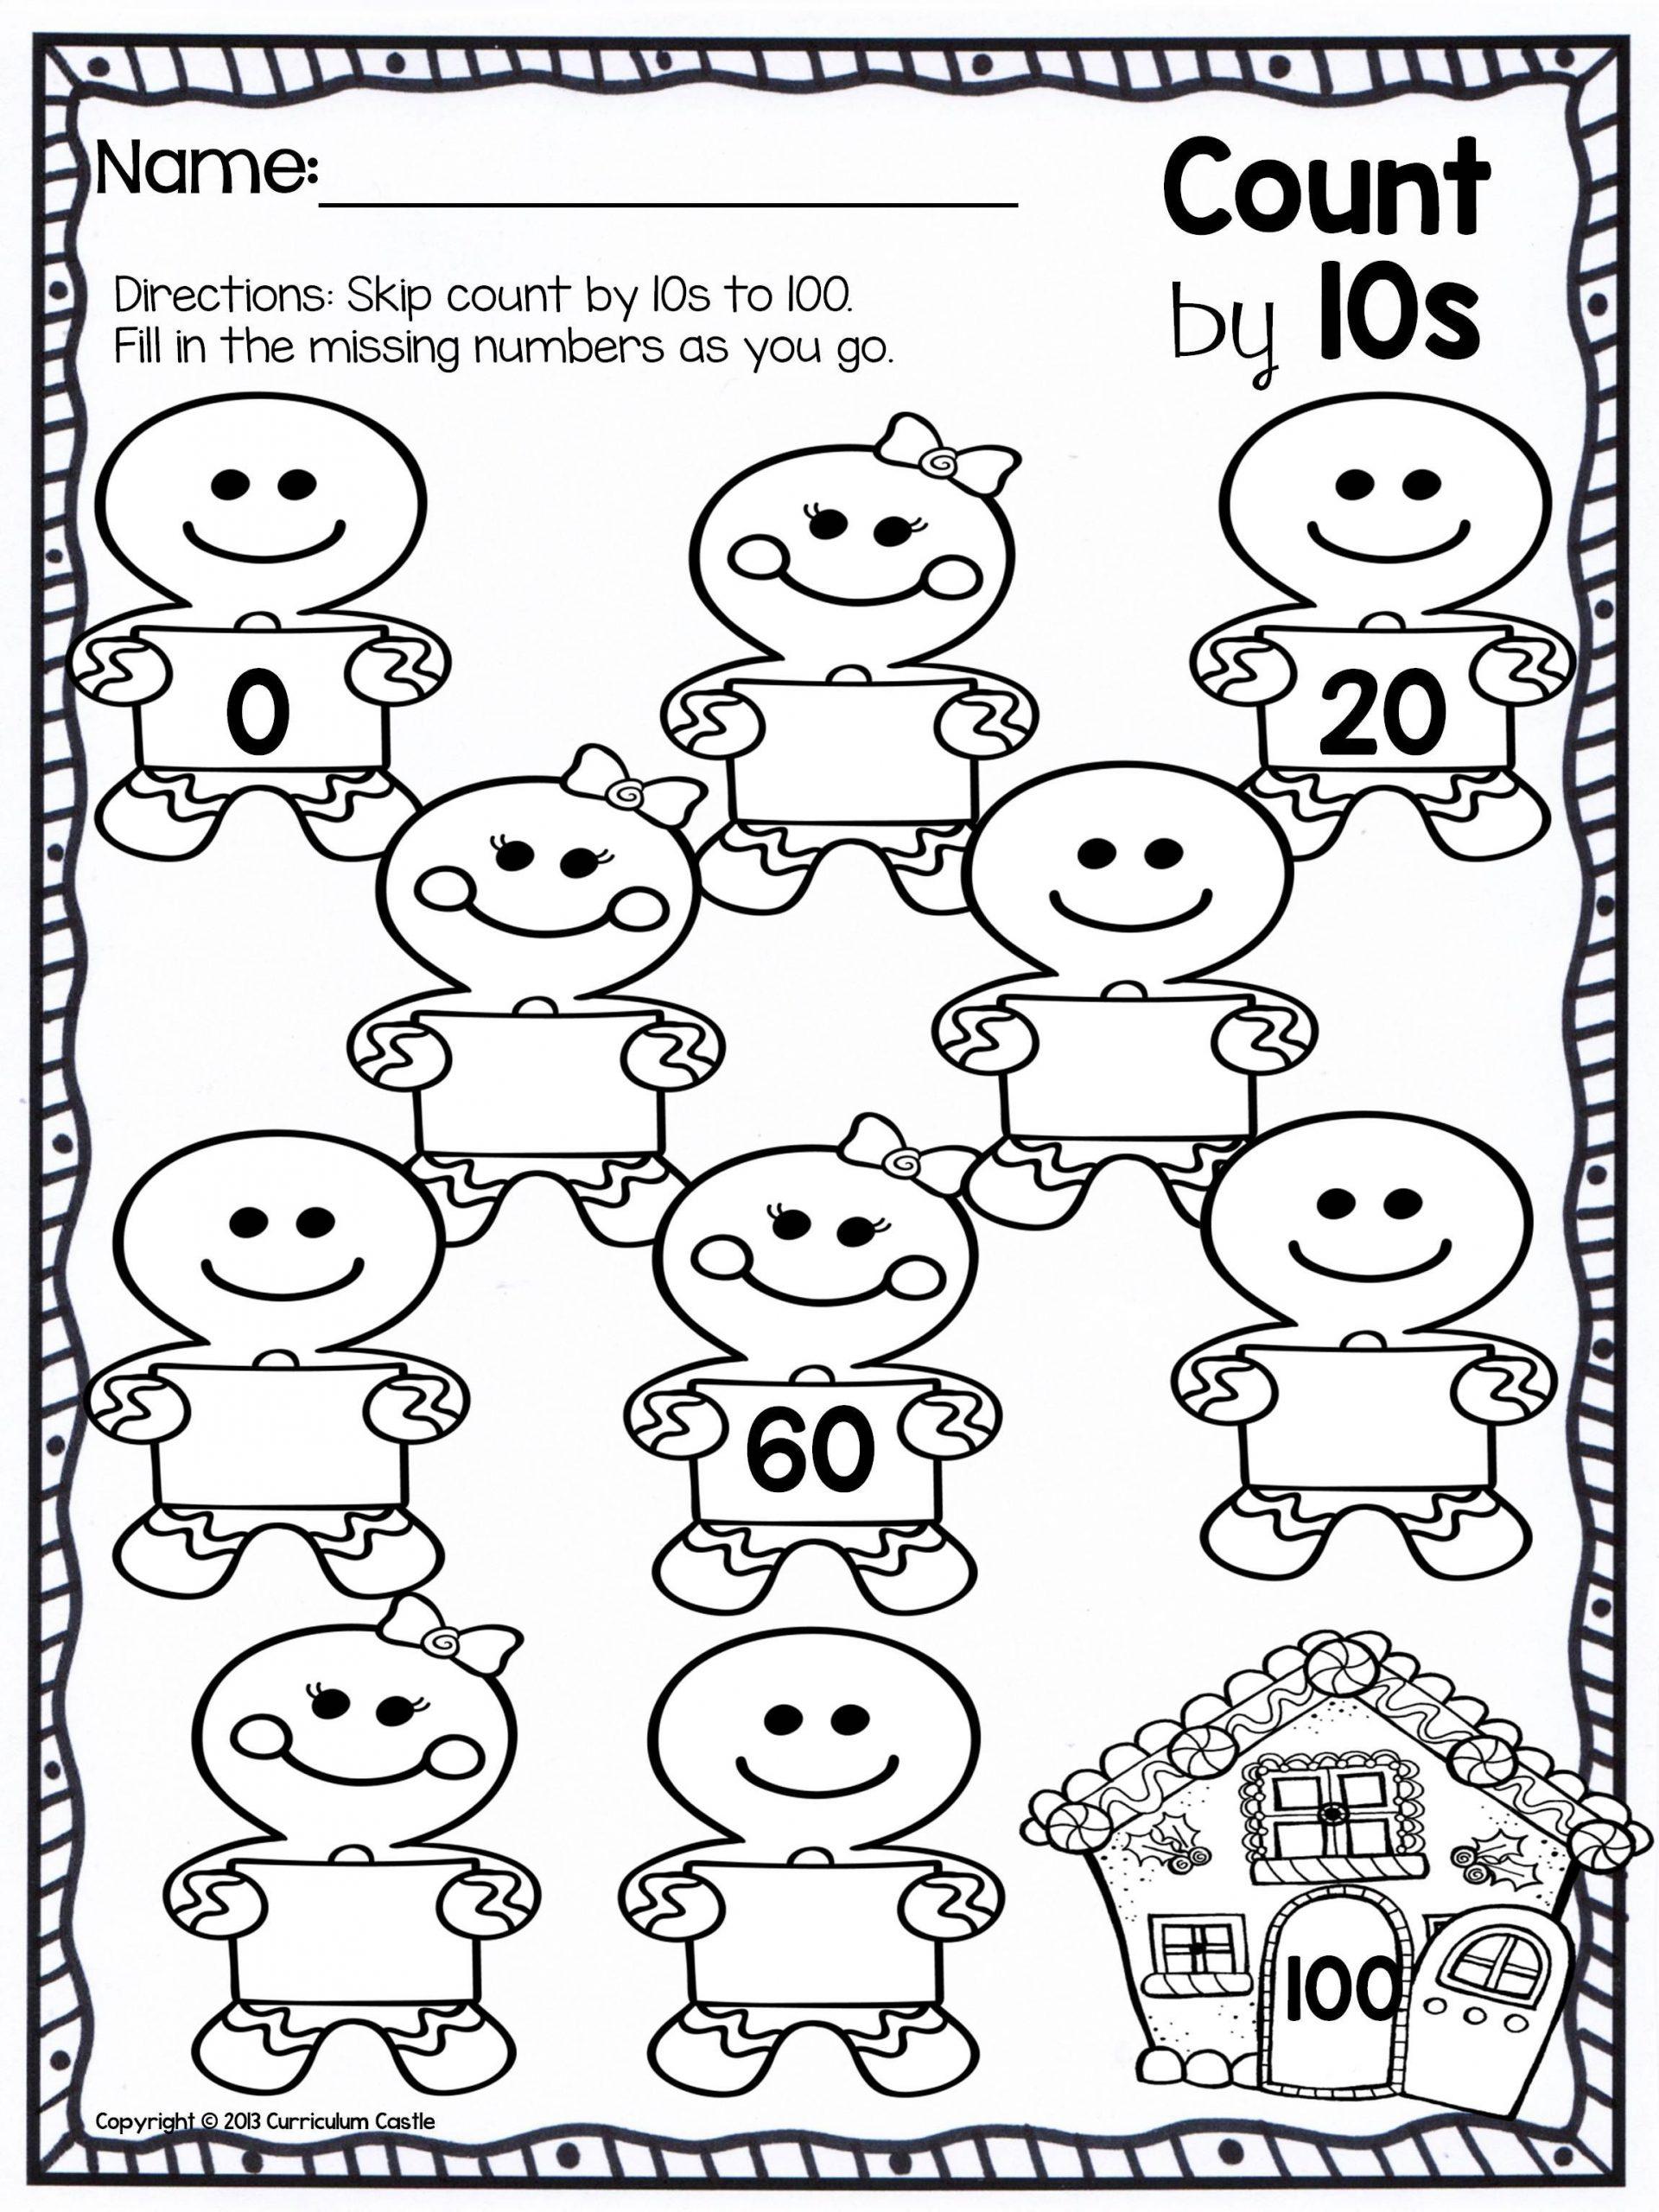 Counting In 10s Worksheet Christmas Skip Counting Freebie